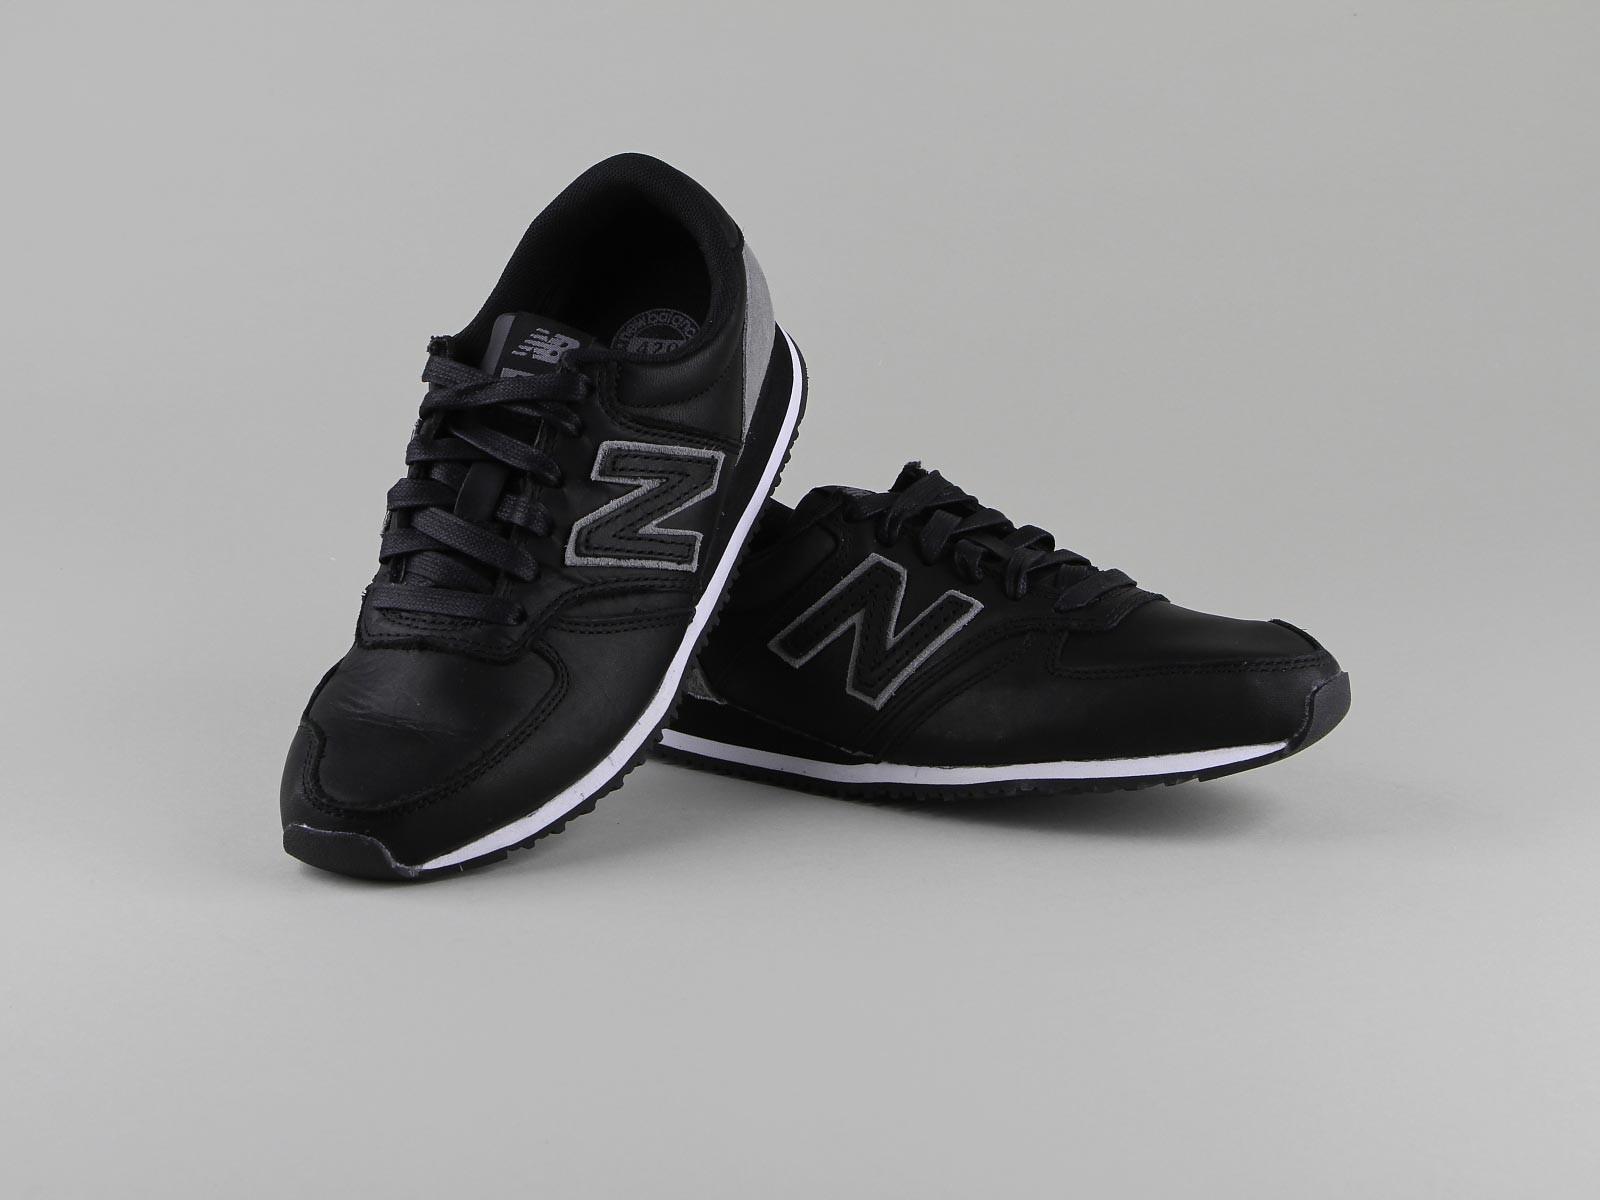 new balance 996 femme noir or